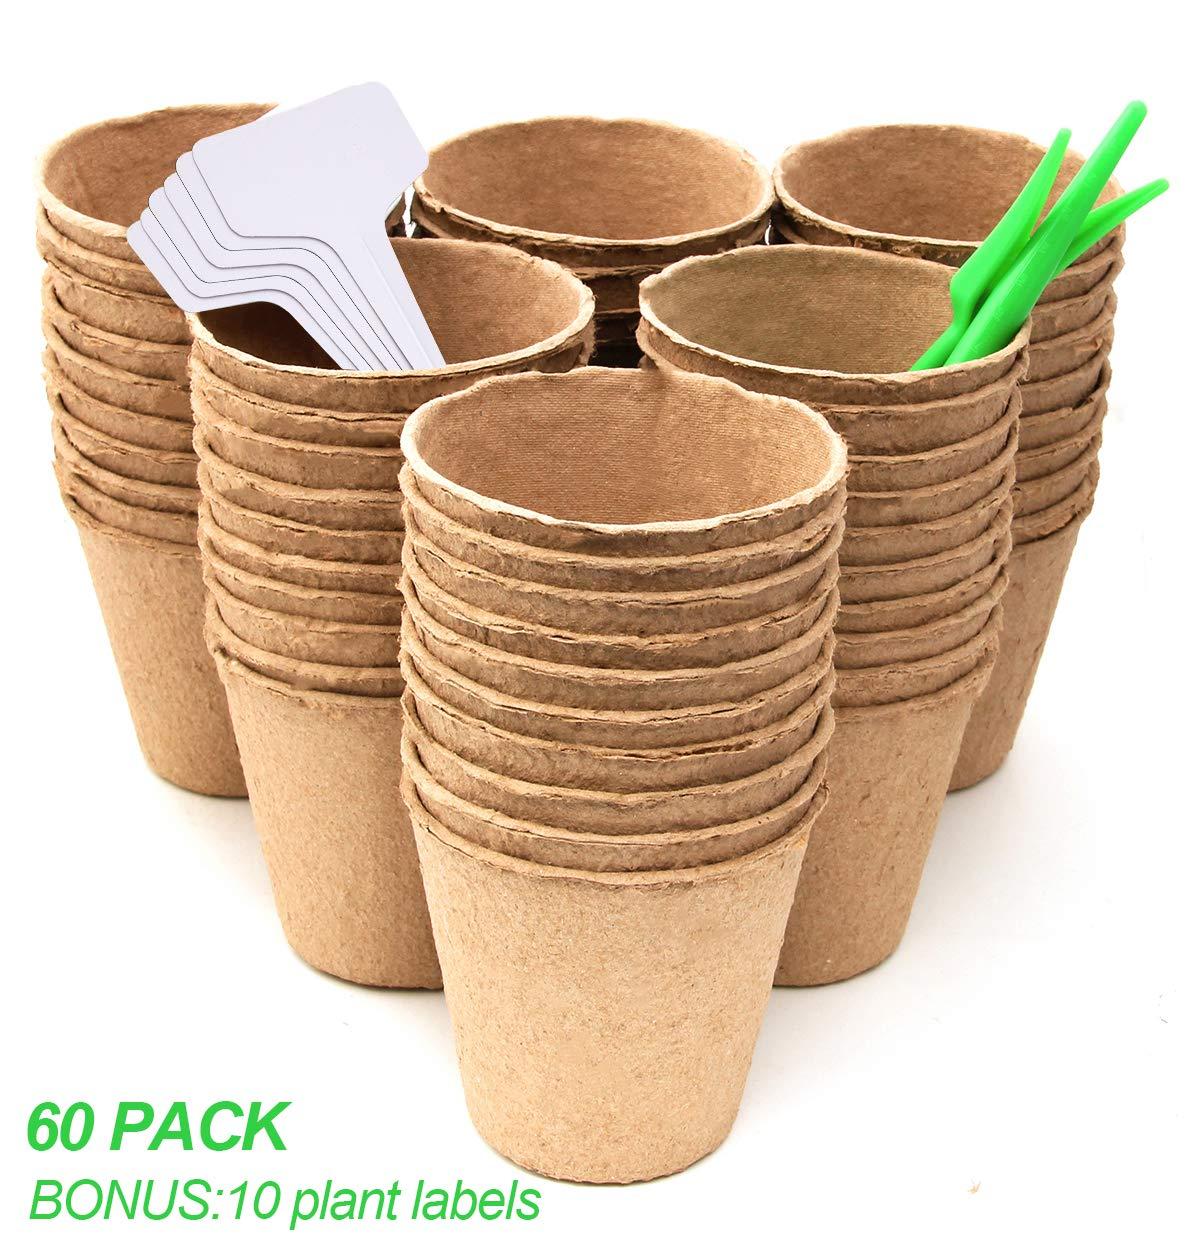 Coolrunner 3 Inch Peat Pots 60 Pack , Seedling Herb Seed Starter Pots Kit, Plant Starters, Germination Nursery Pots Bonus 10 Plant Labels